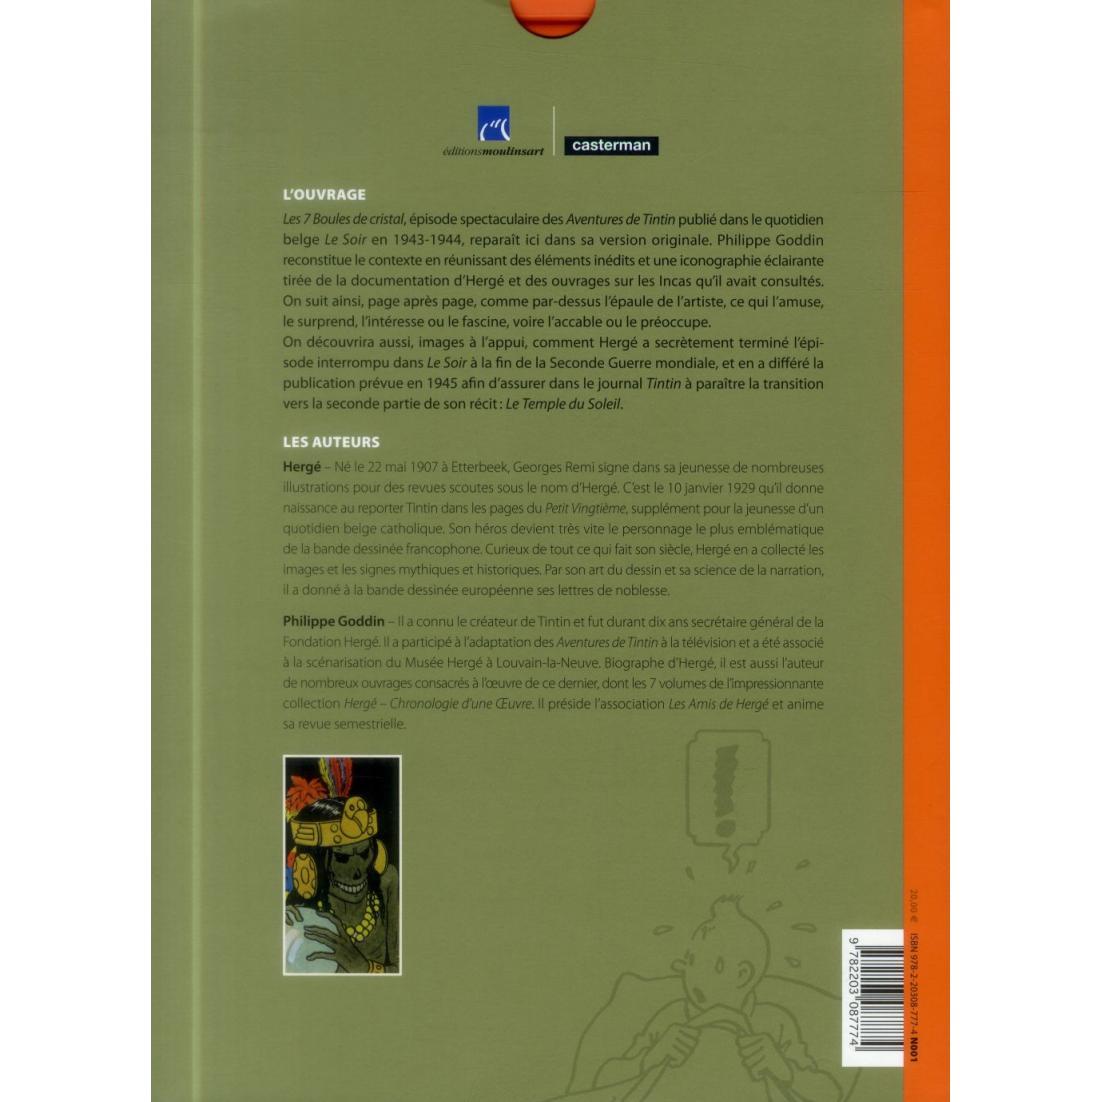 LA MALÉDICTION DE RASCAR CAPAC, TOME 1